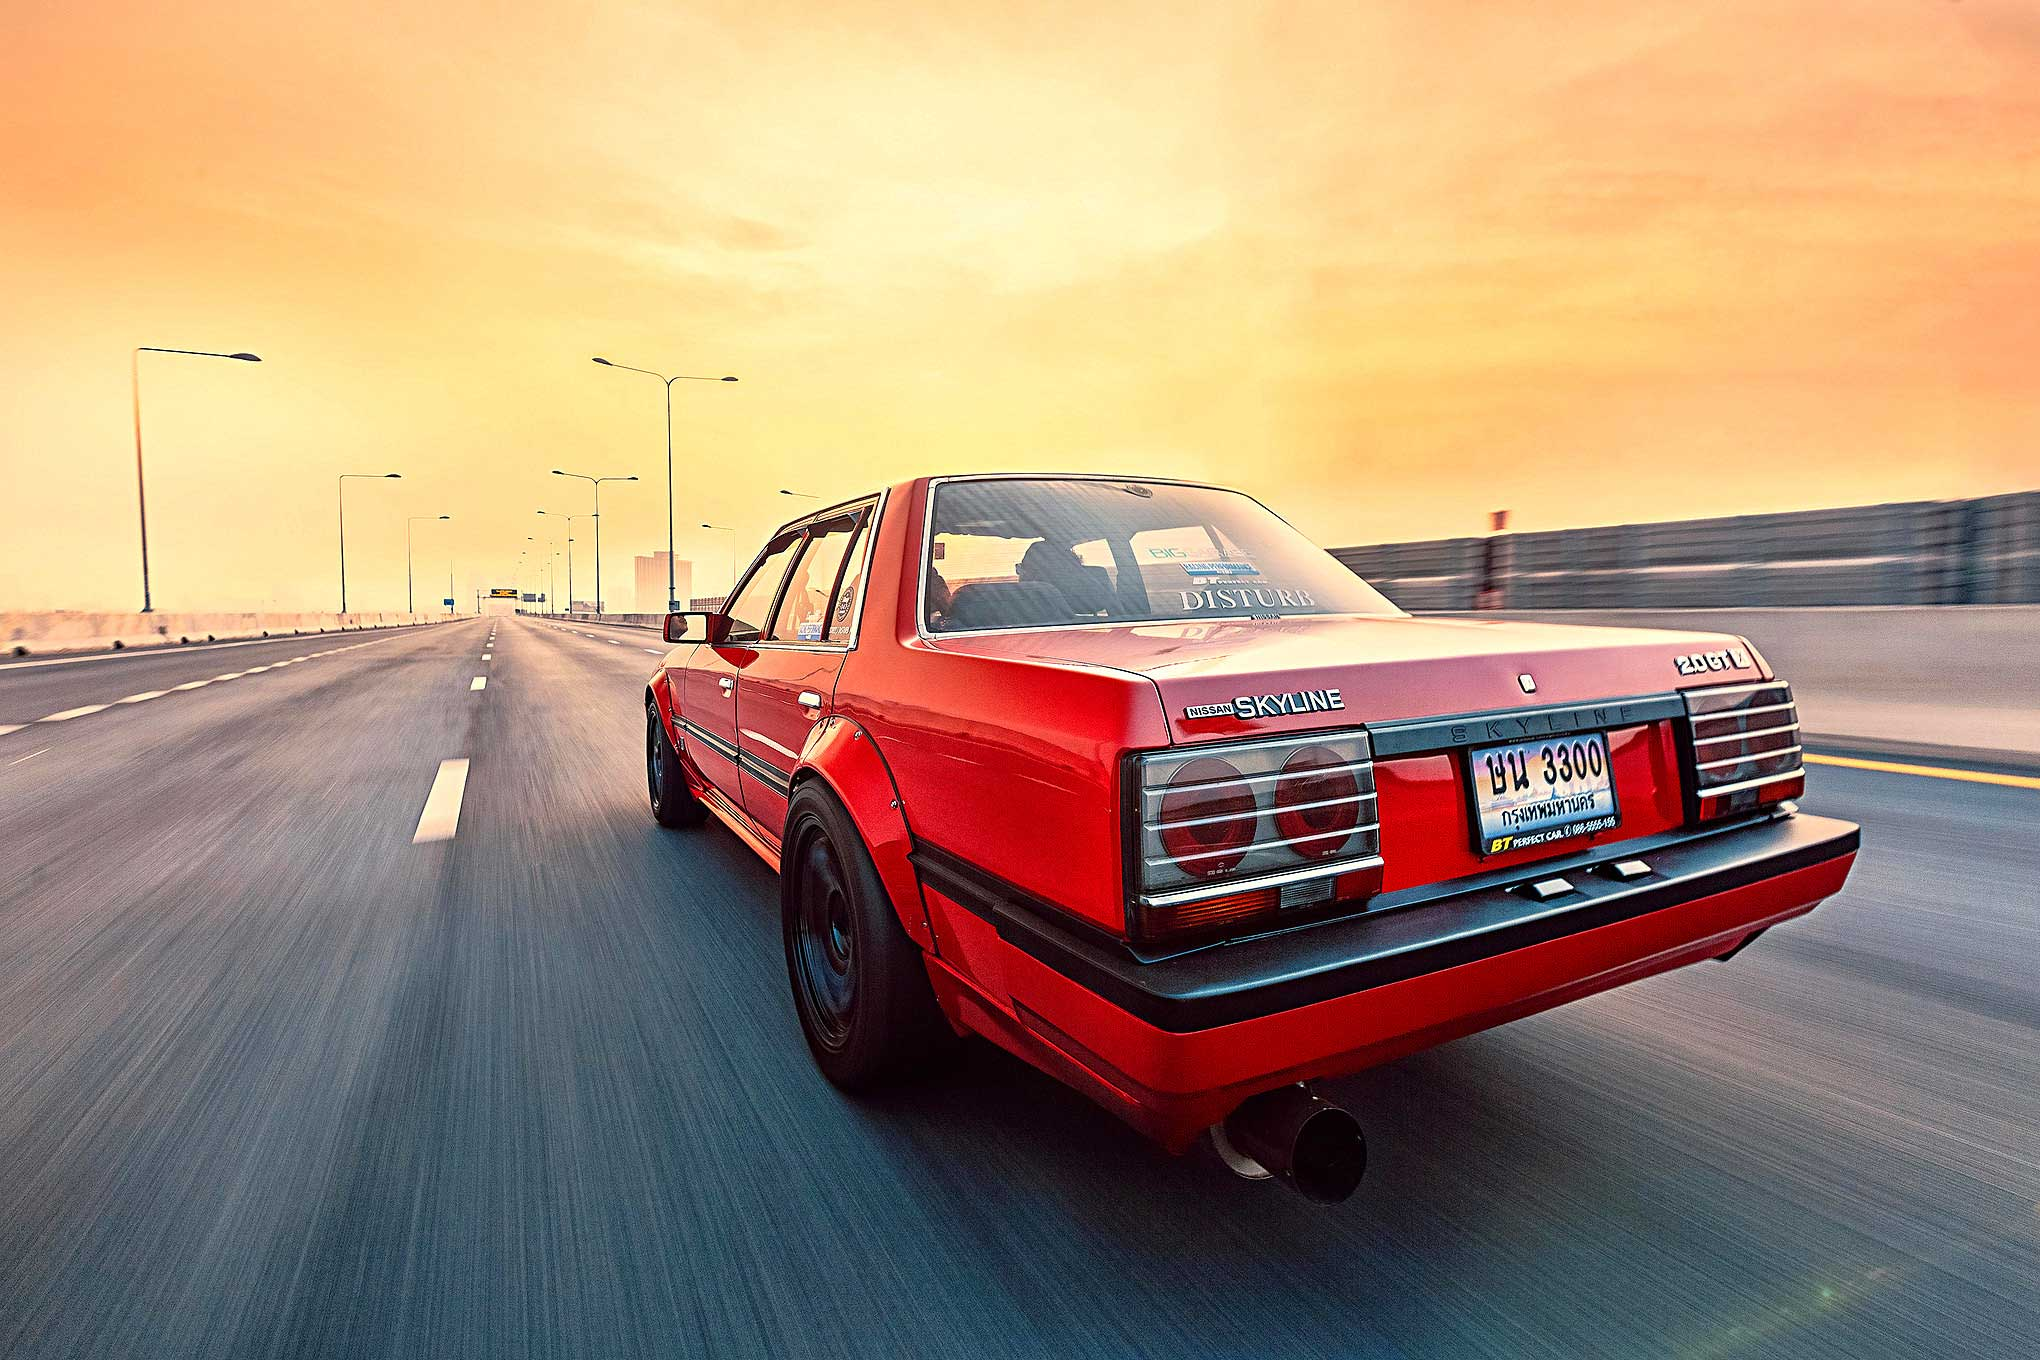 1987 Nissan Skyline R30 Photo & Image Gallery